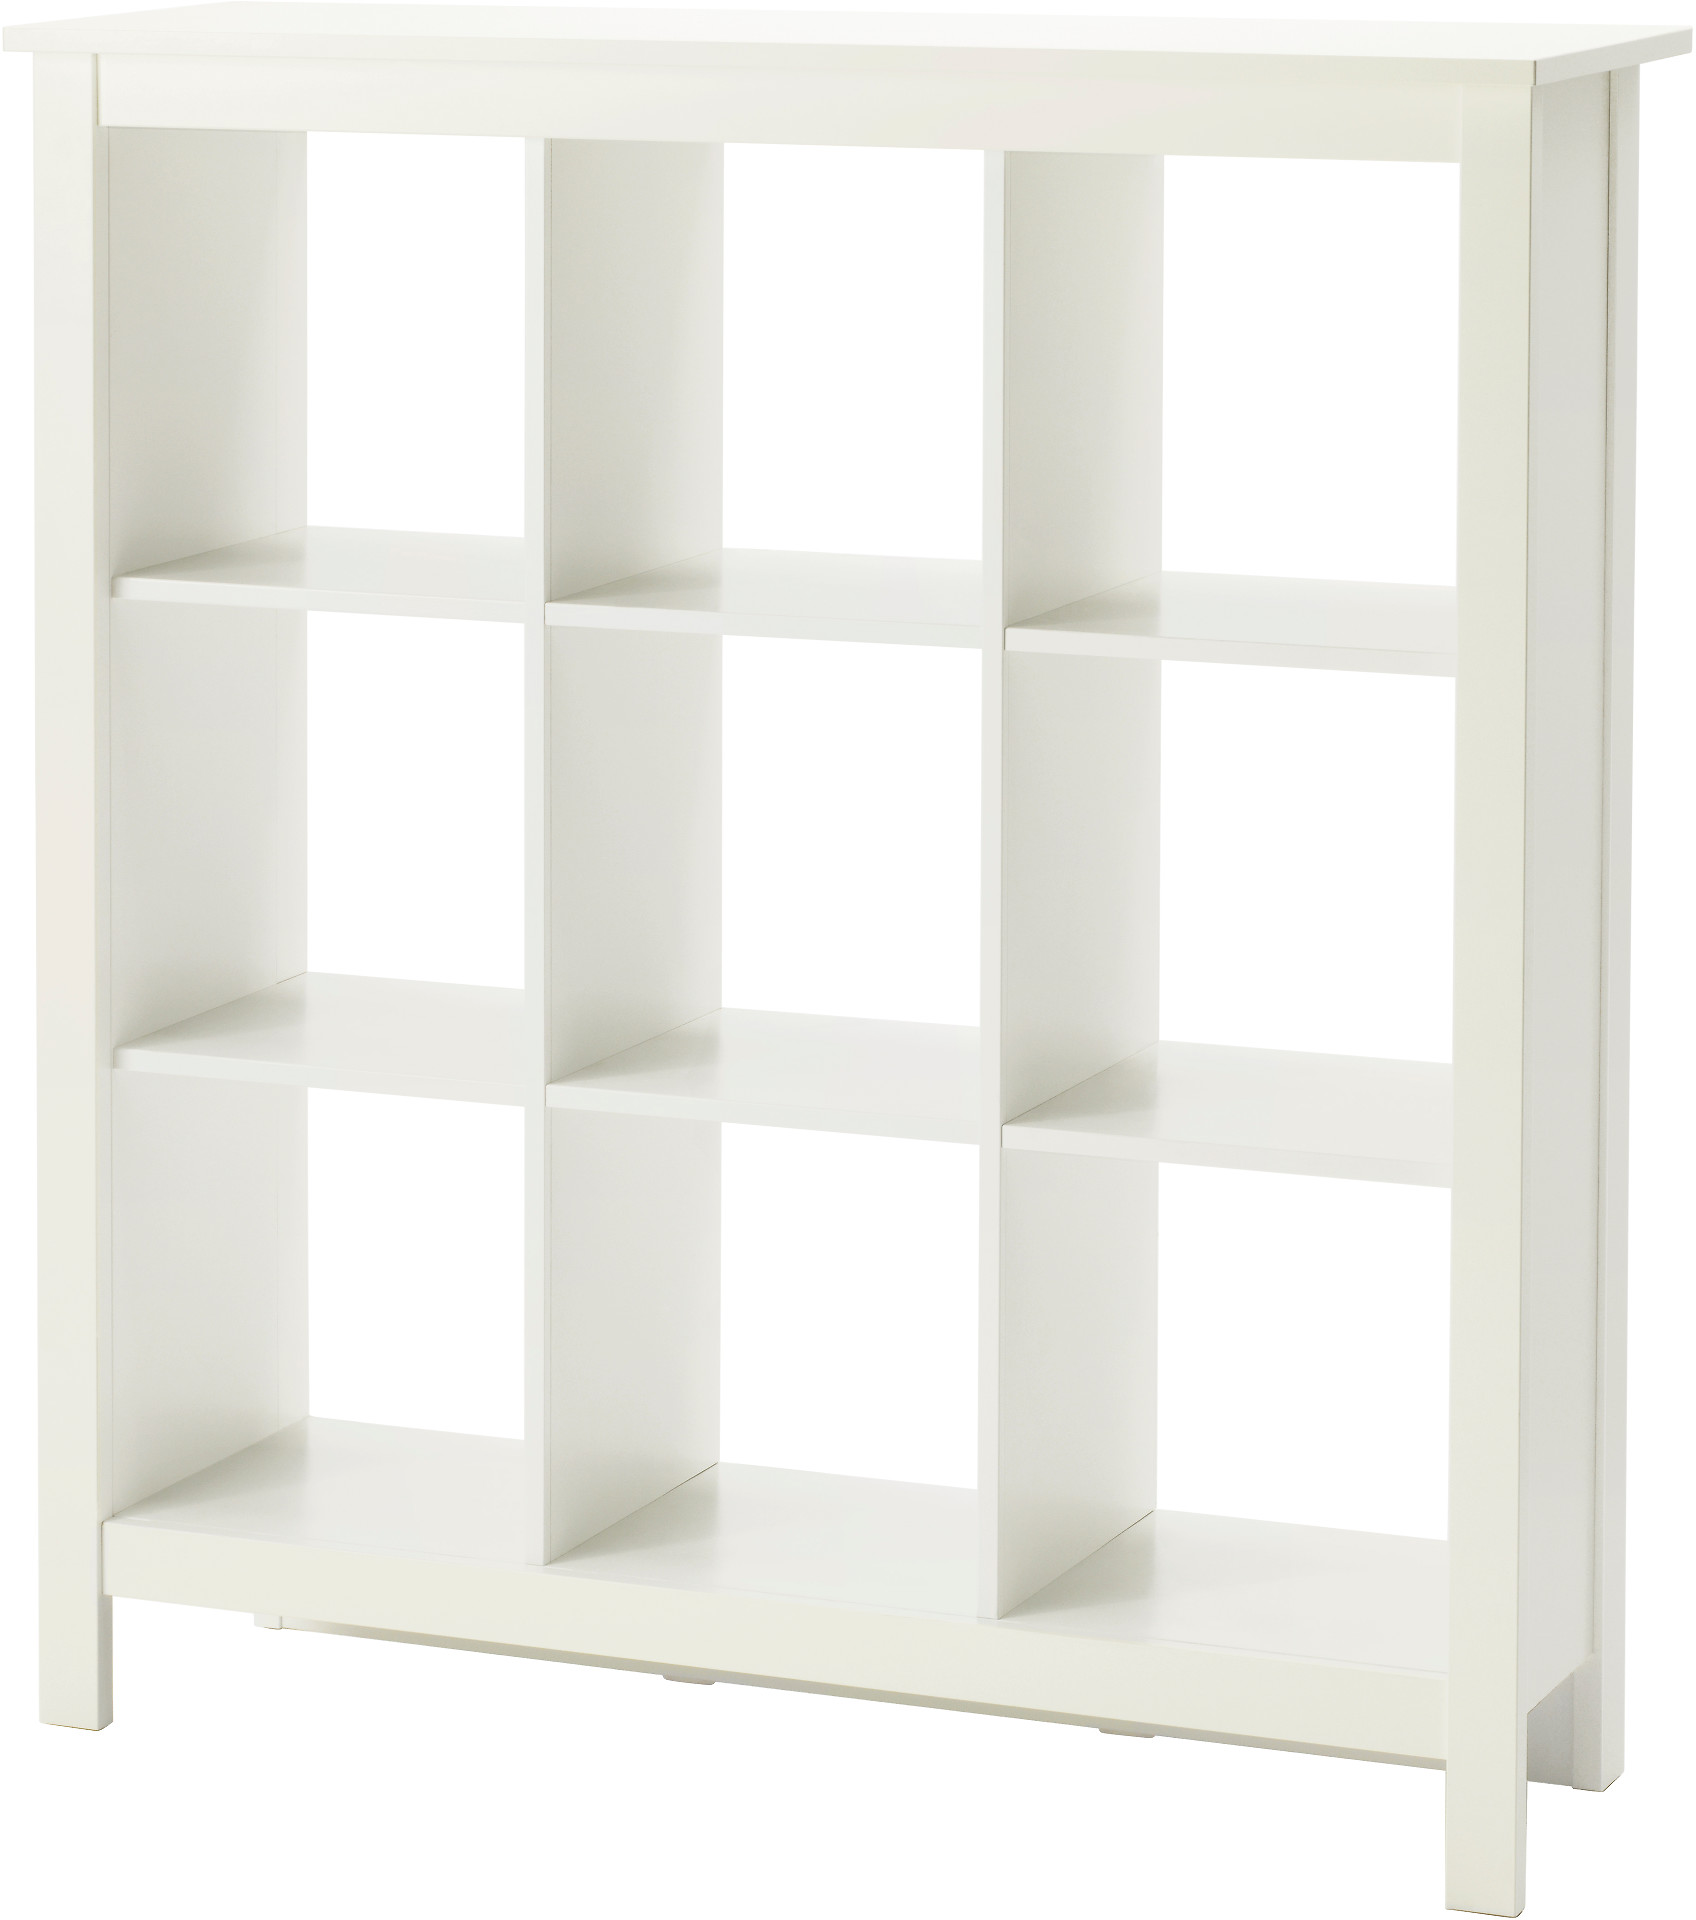 TOMNÄS Shelf unit - black-brown - IKEA